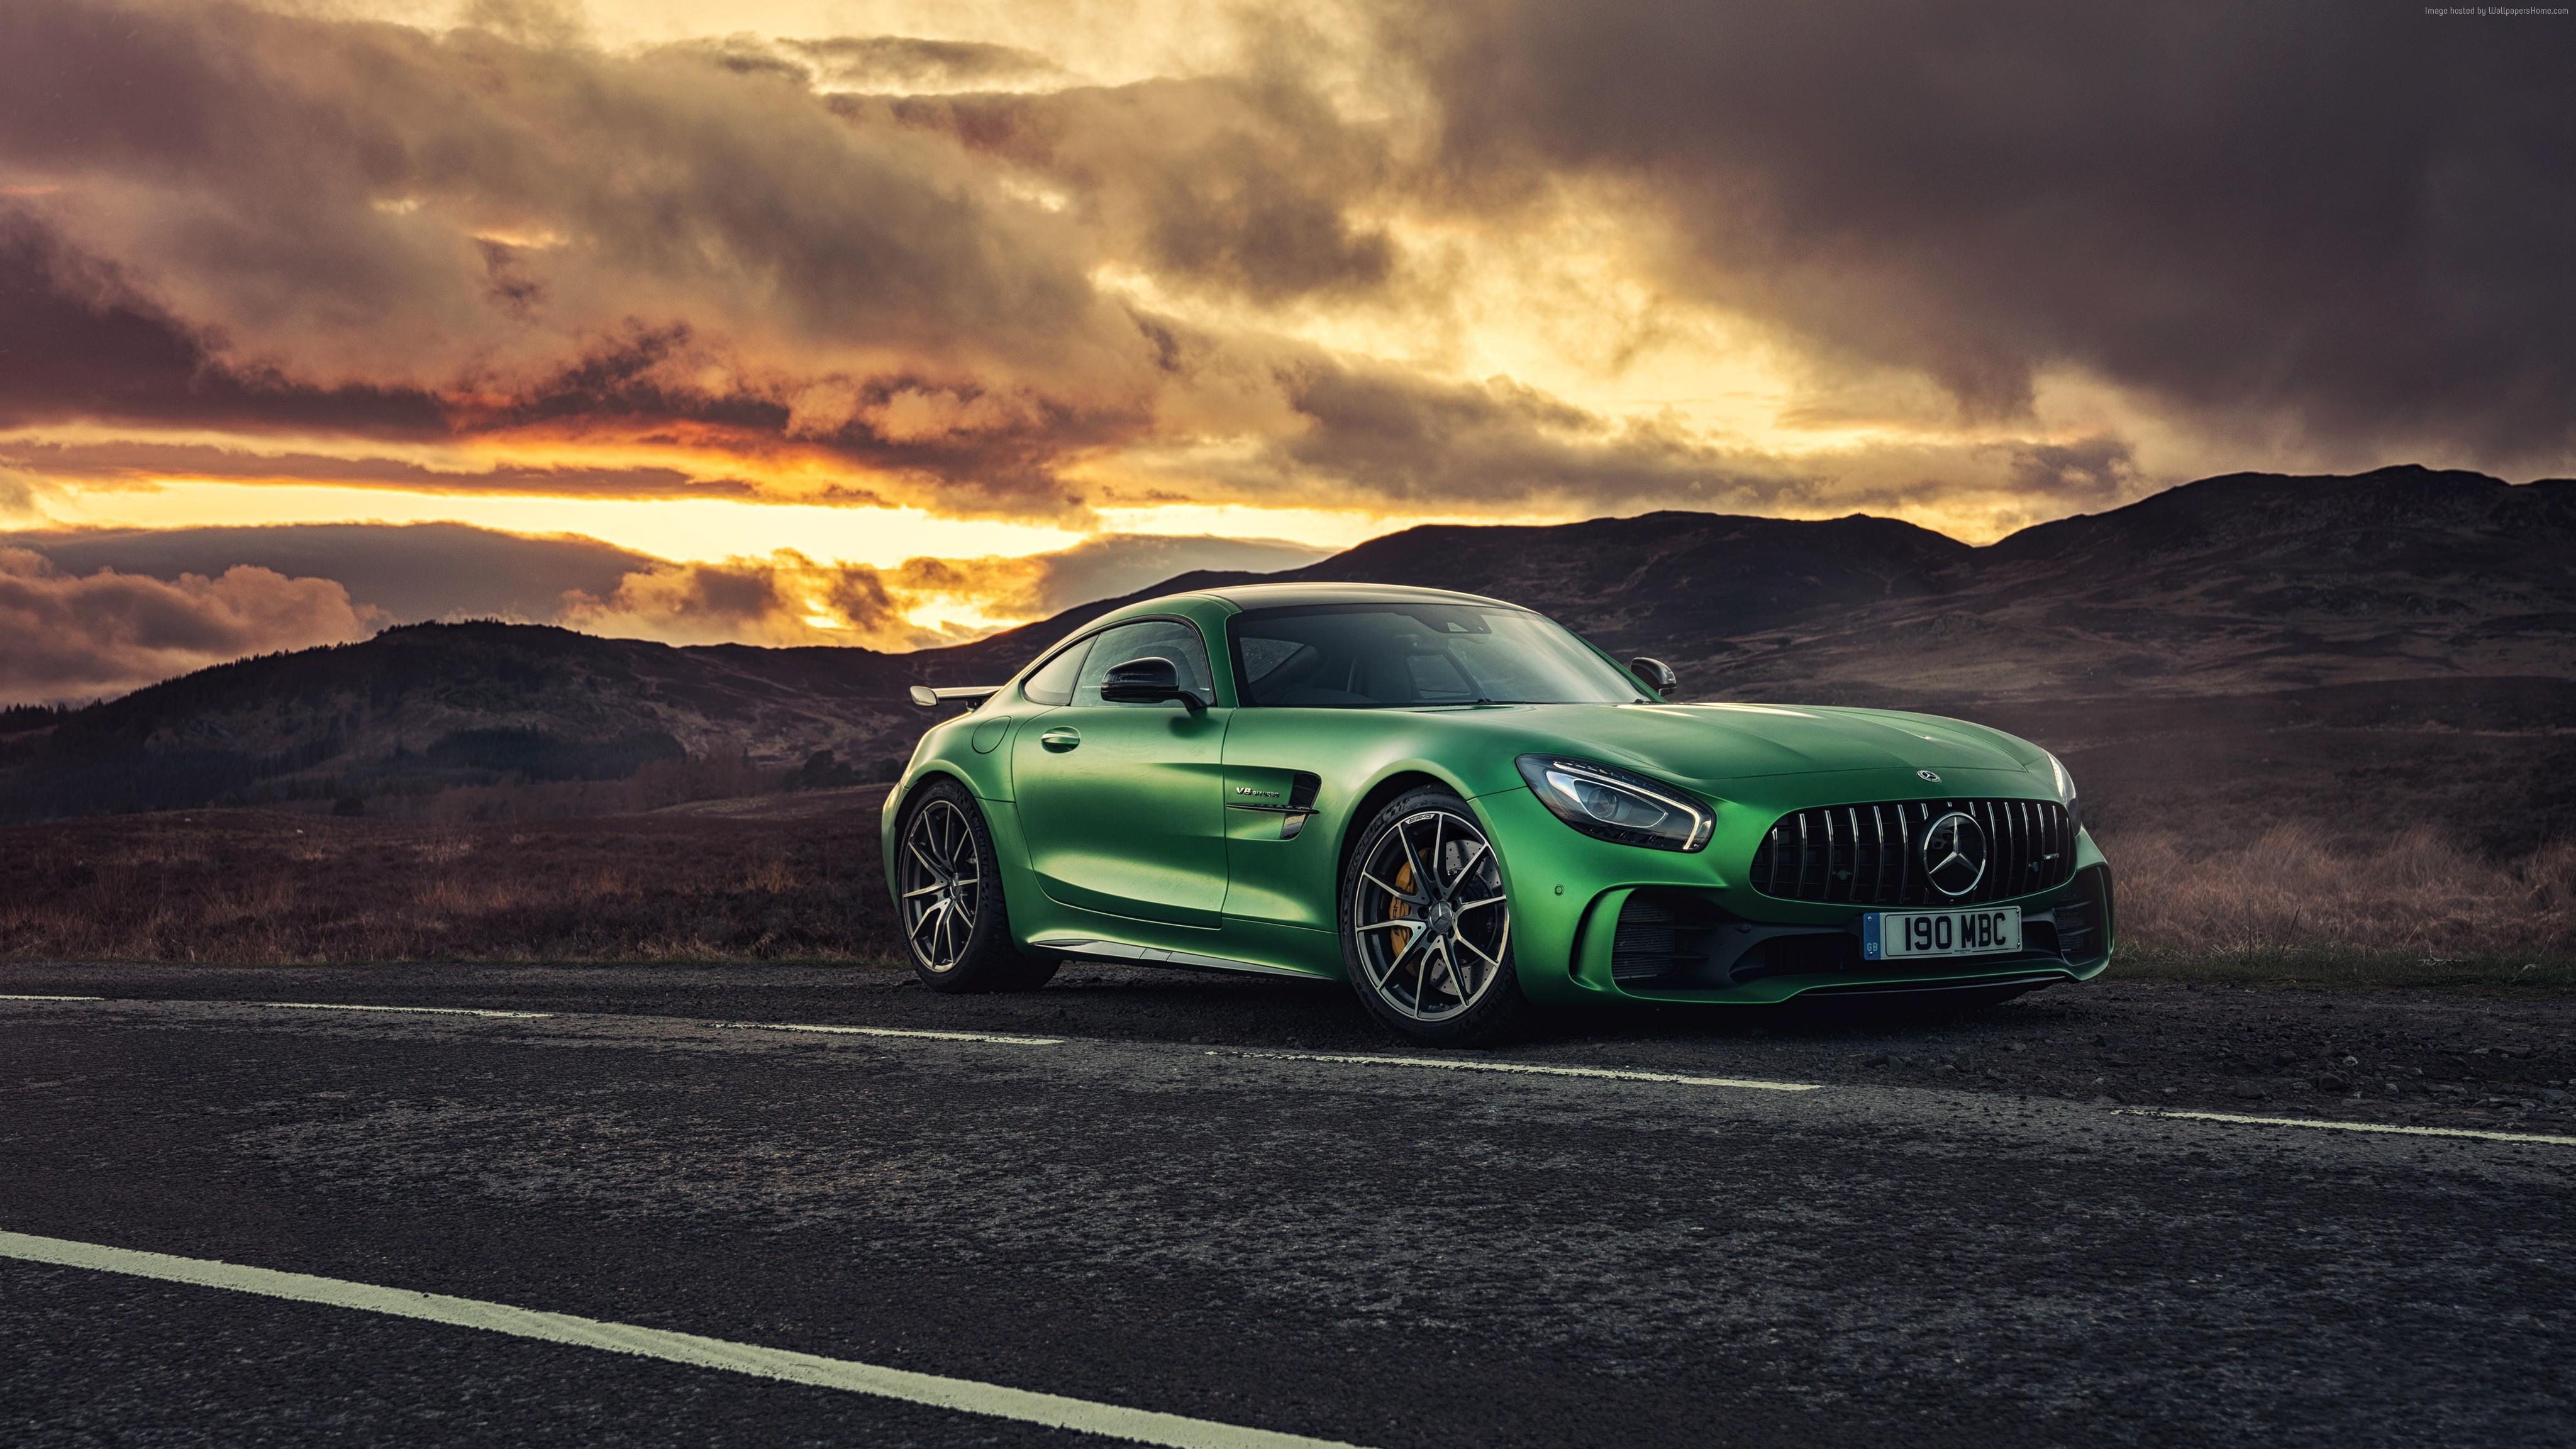 Green Mercedes Benz Amg GT 4k, HD Cars, 4k Wallpapers ...